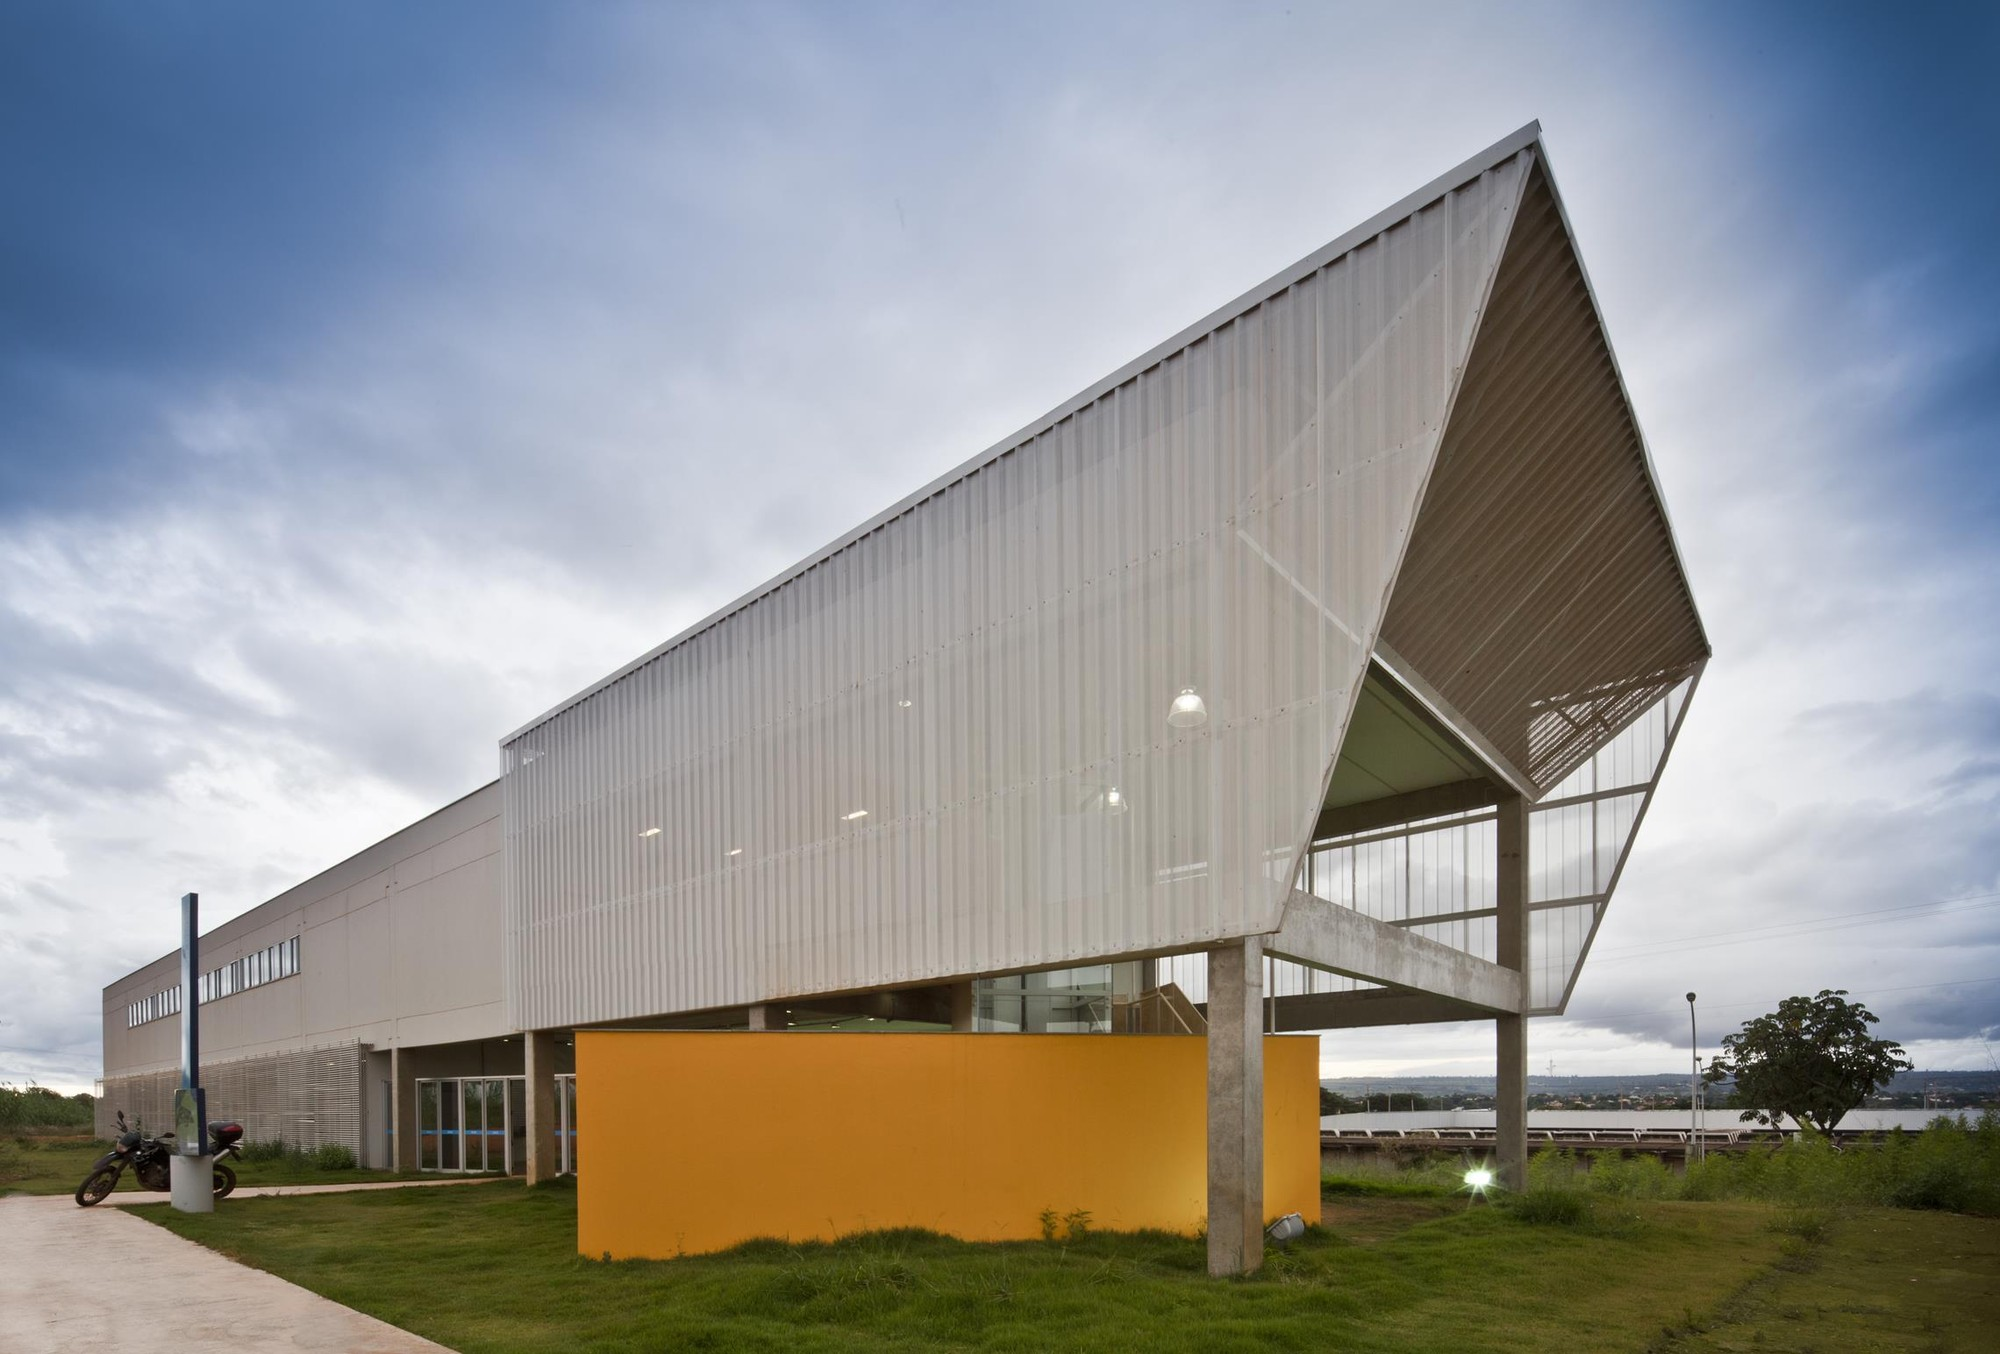 Bloque de salas de aula norte ceplan plataforma for Aulas web arquitectura